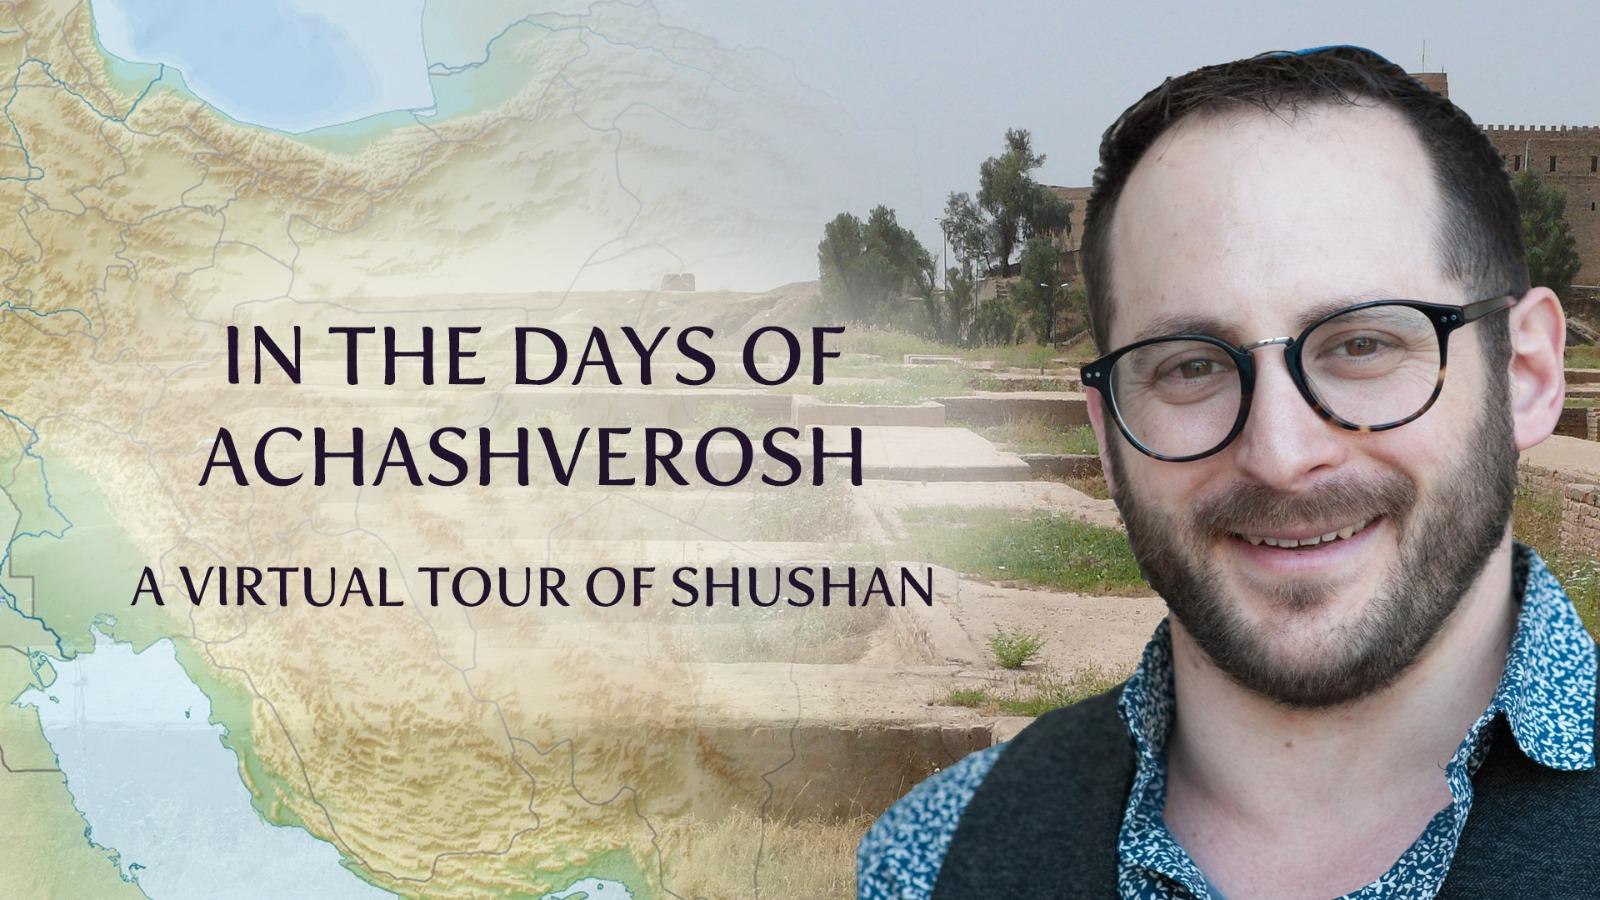 In The Days of Achashverosh